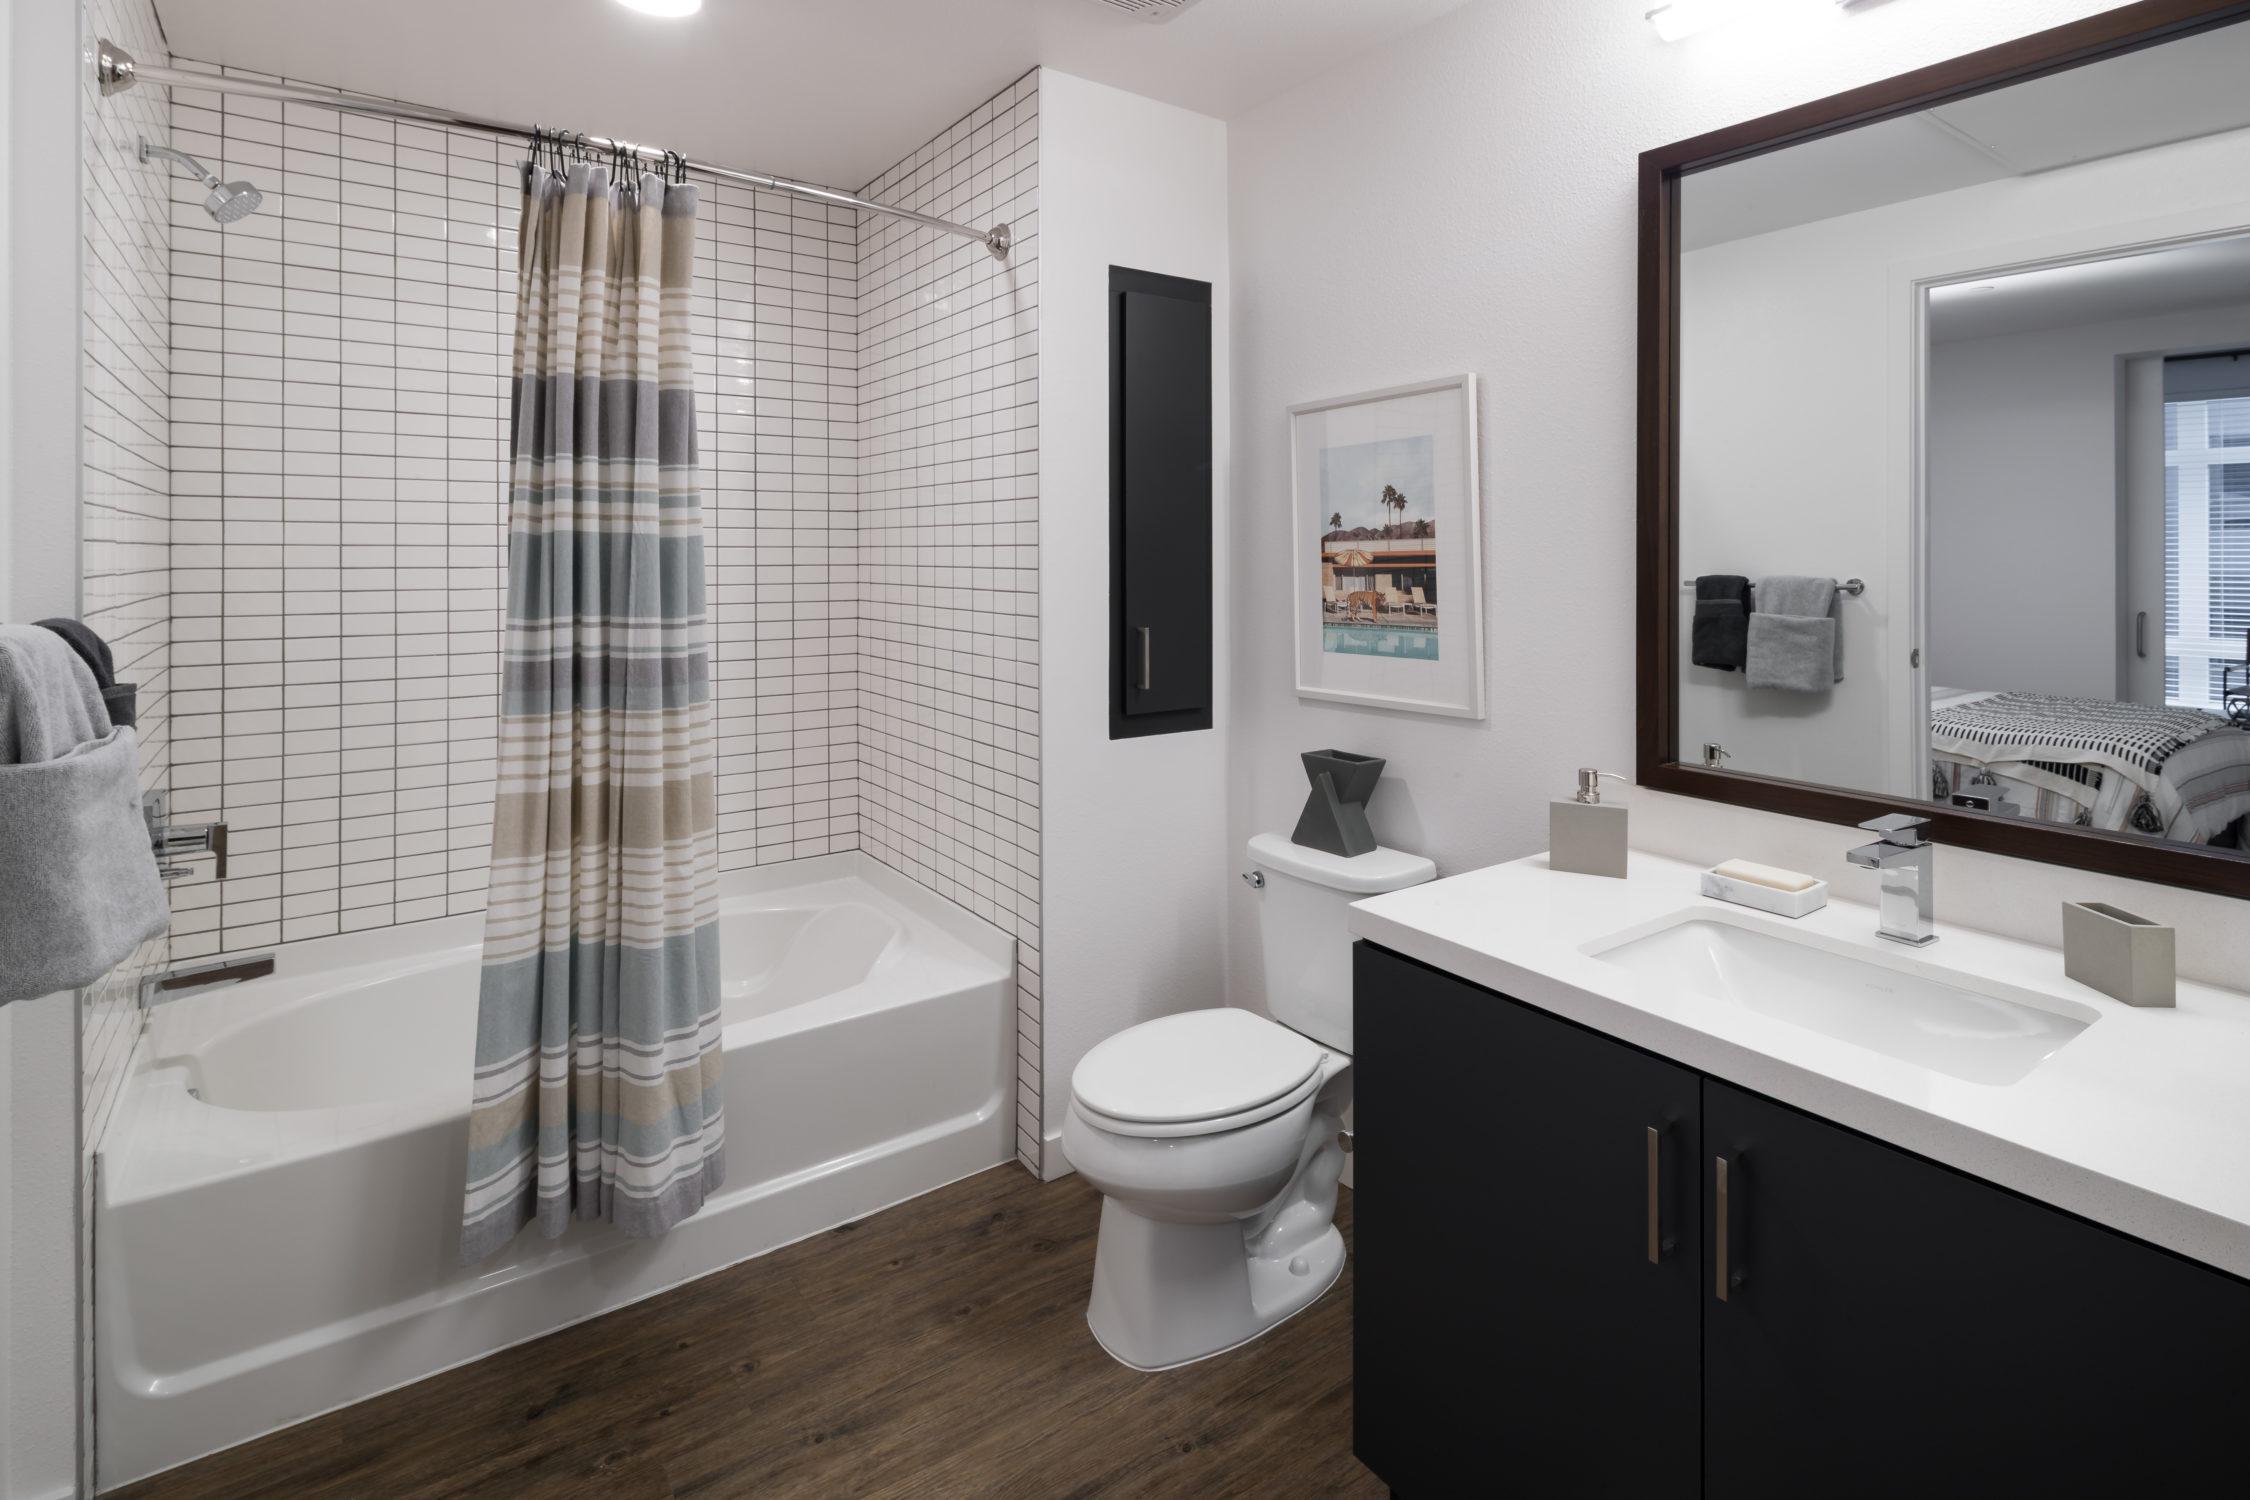 INT 08 One Bedroom Interior Bathroom TCRA 4193 080